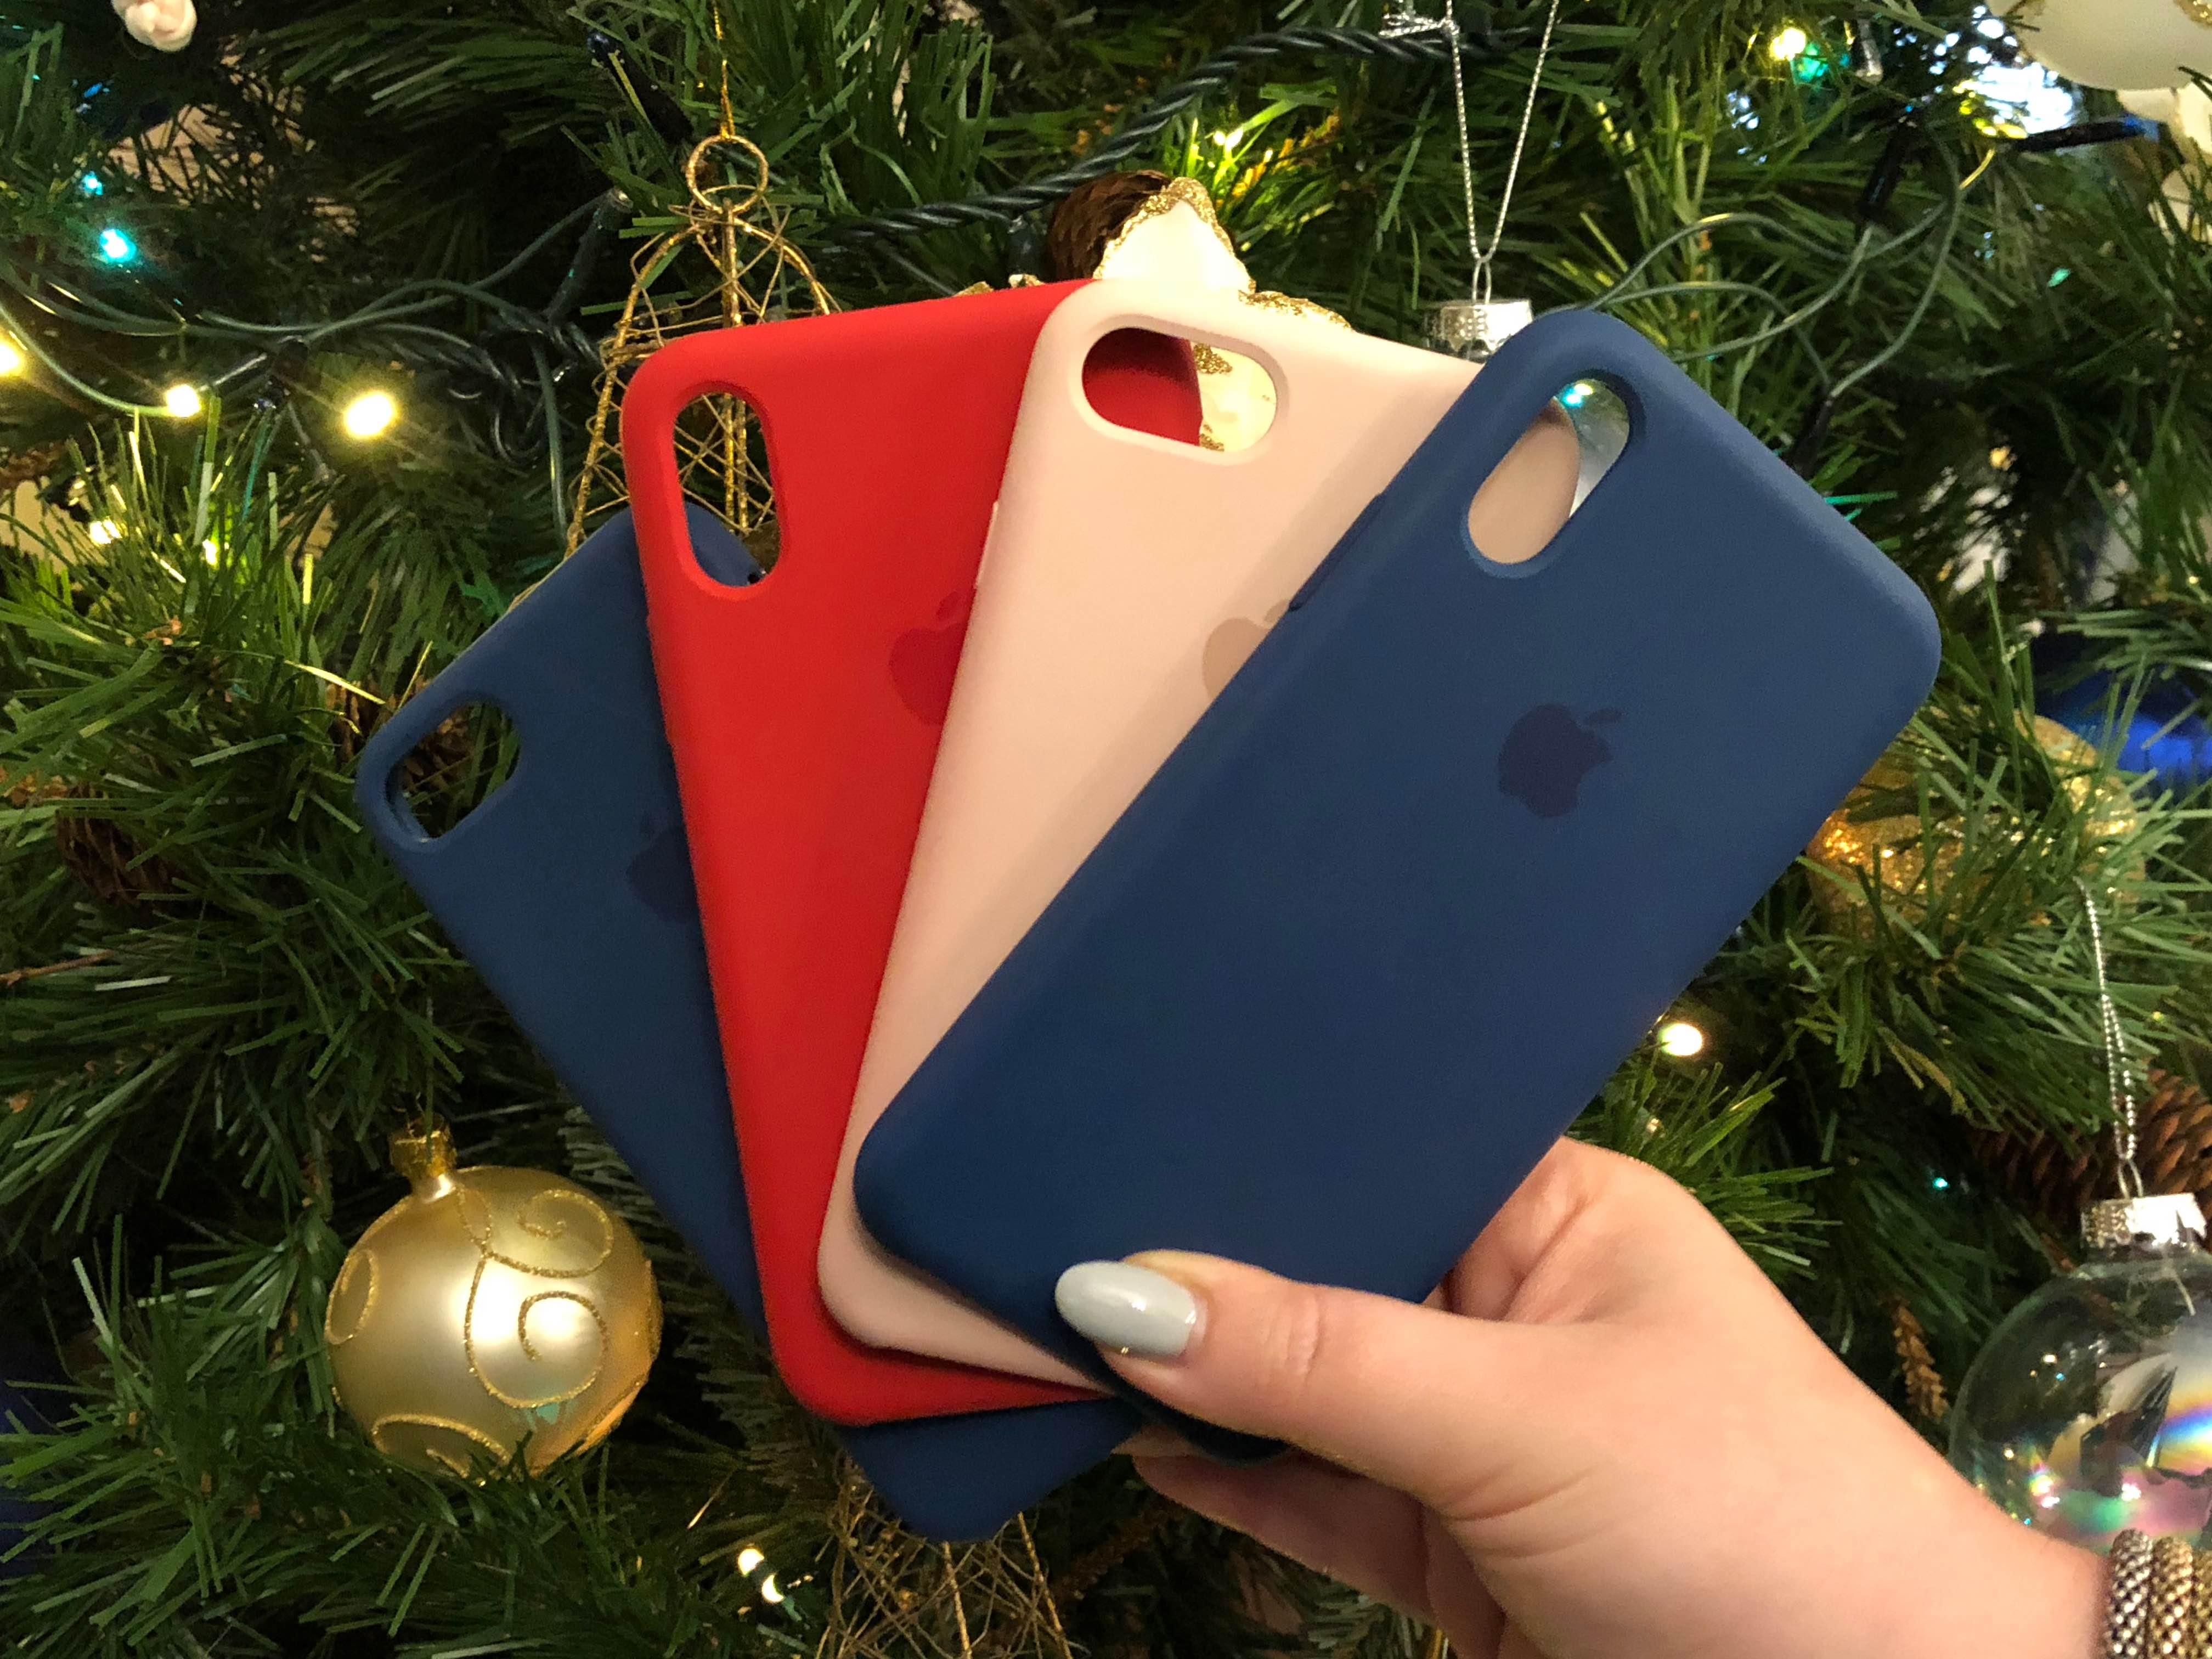 migliore marca per cover iphone